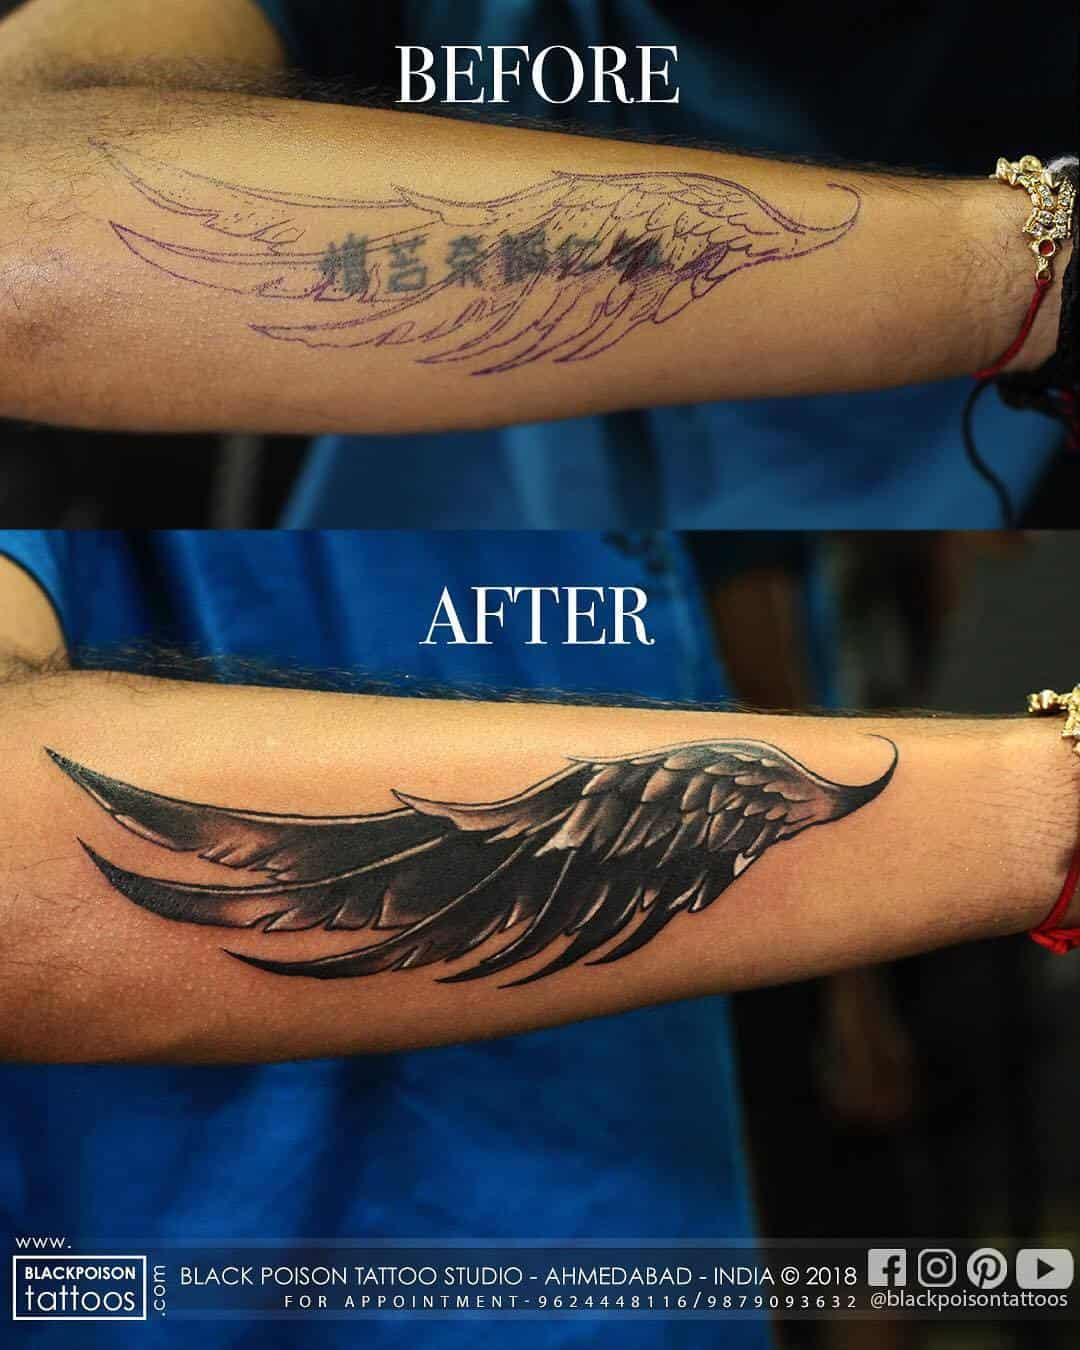 072bd576865c9 ... Black Poison Tattoos Photos, Vastrapur, Ahmedabad - Tattoo Artists ...